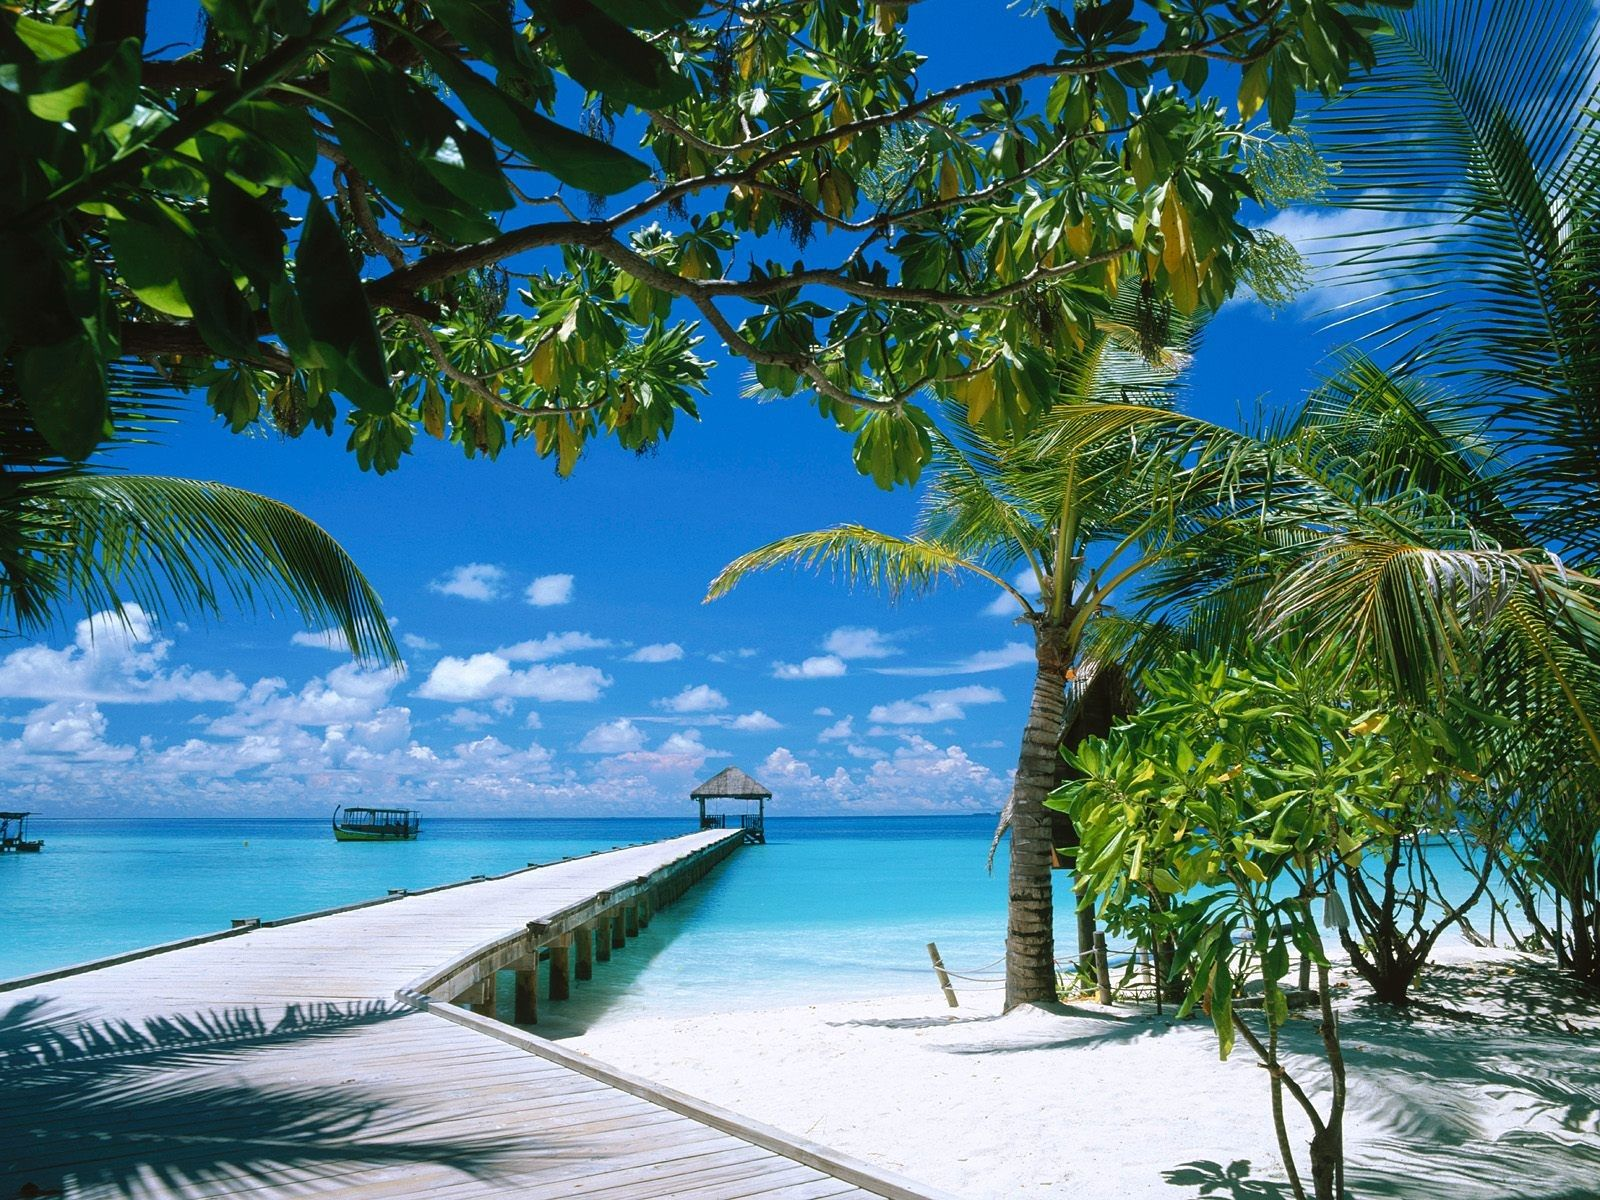 Wallpaper clipart tropical Island Island Clipart  Tropical